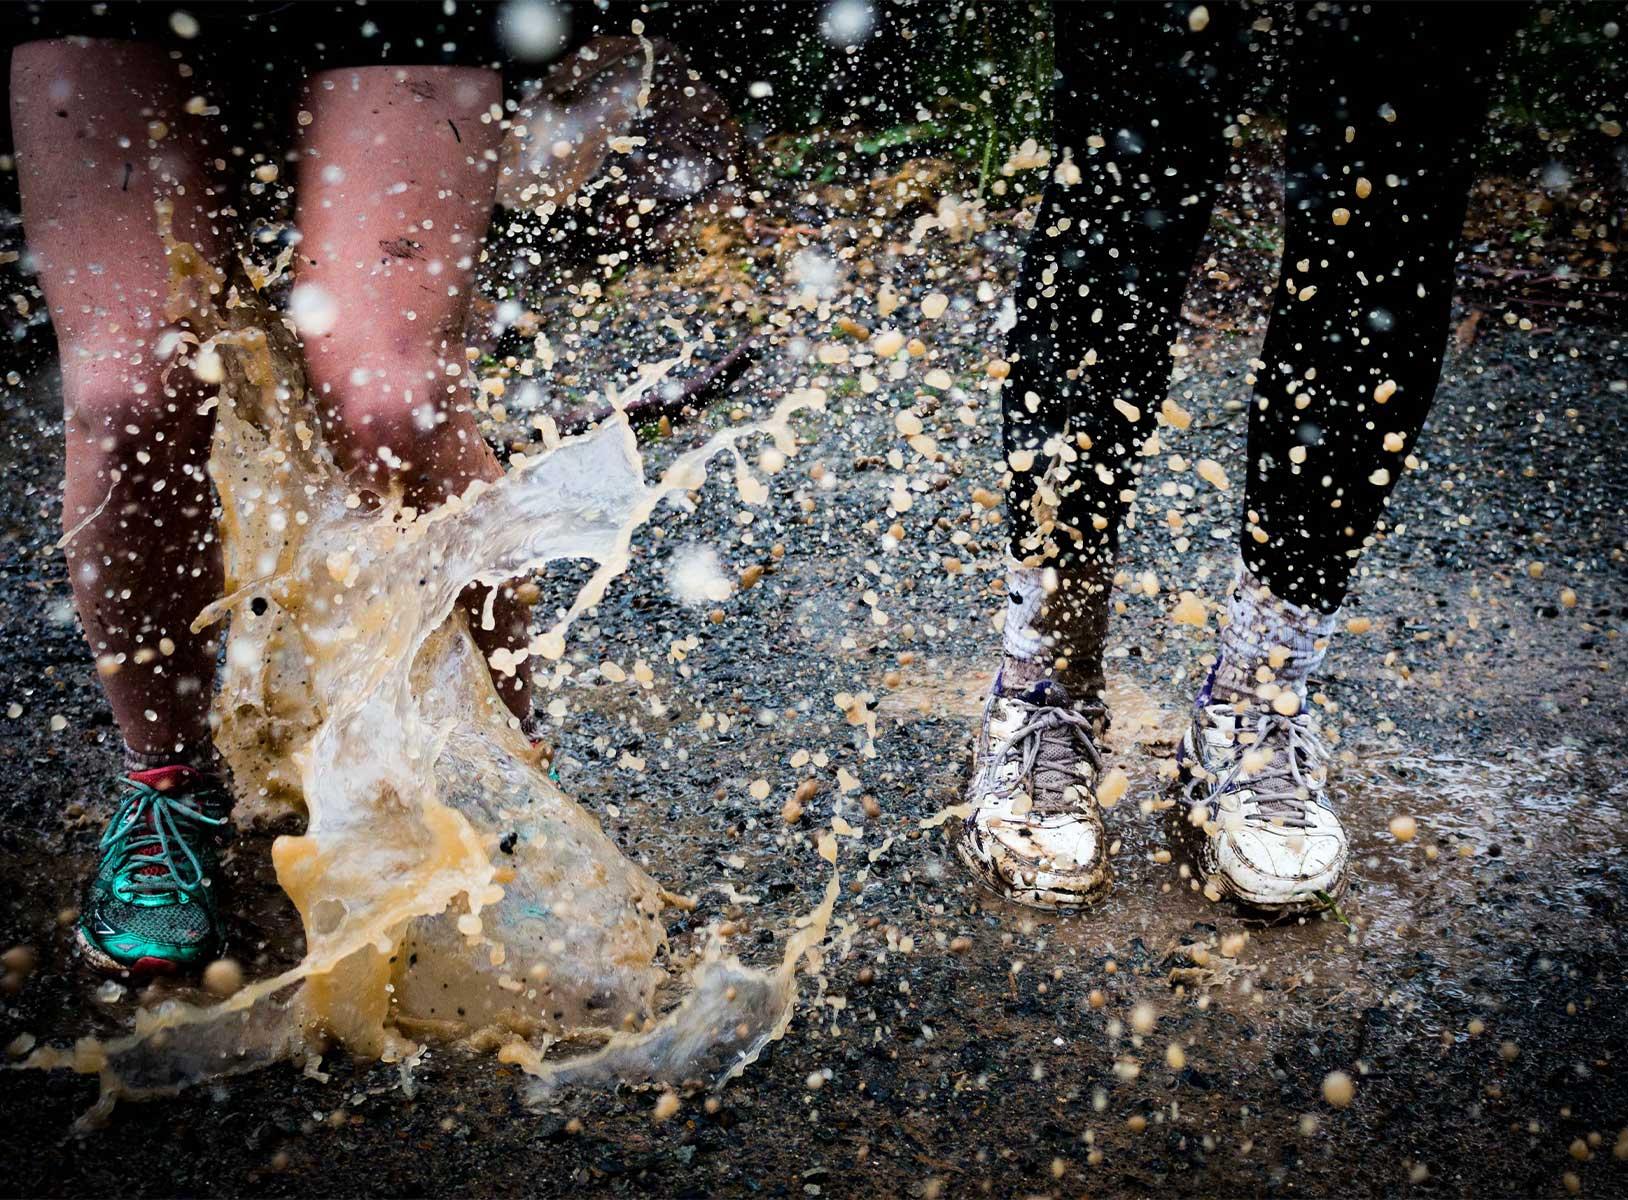 Two people splashing in puddles while running